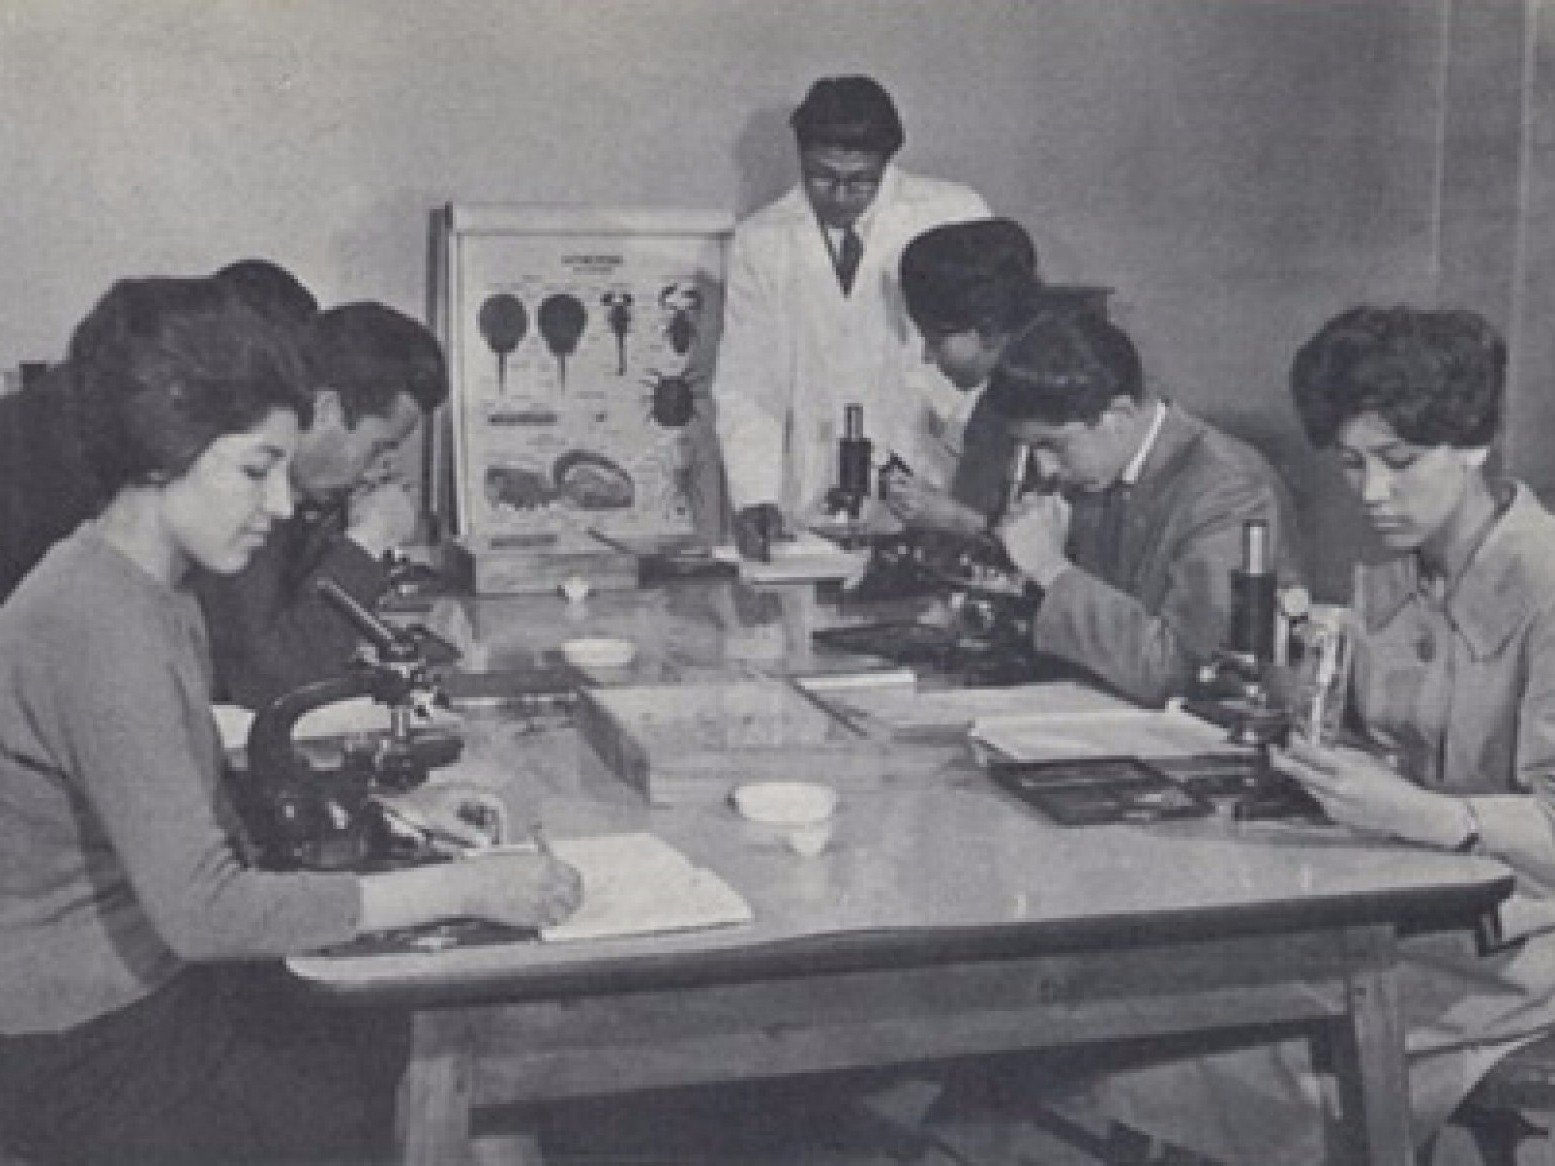 old school scientists